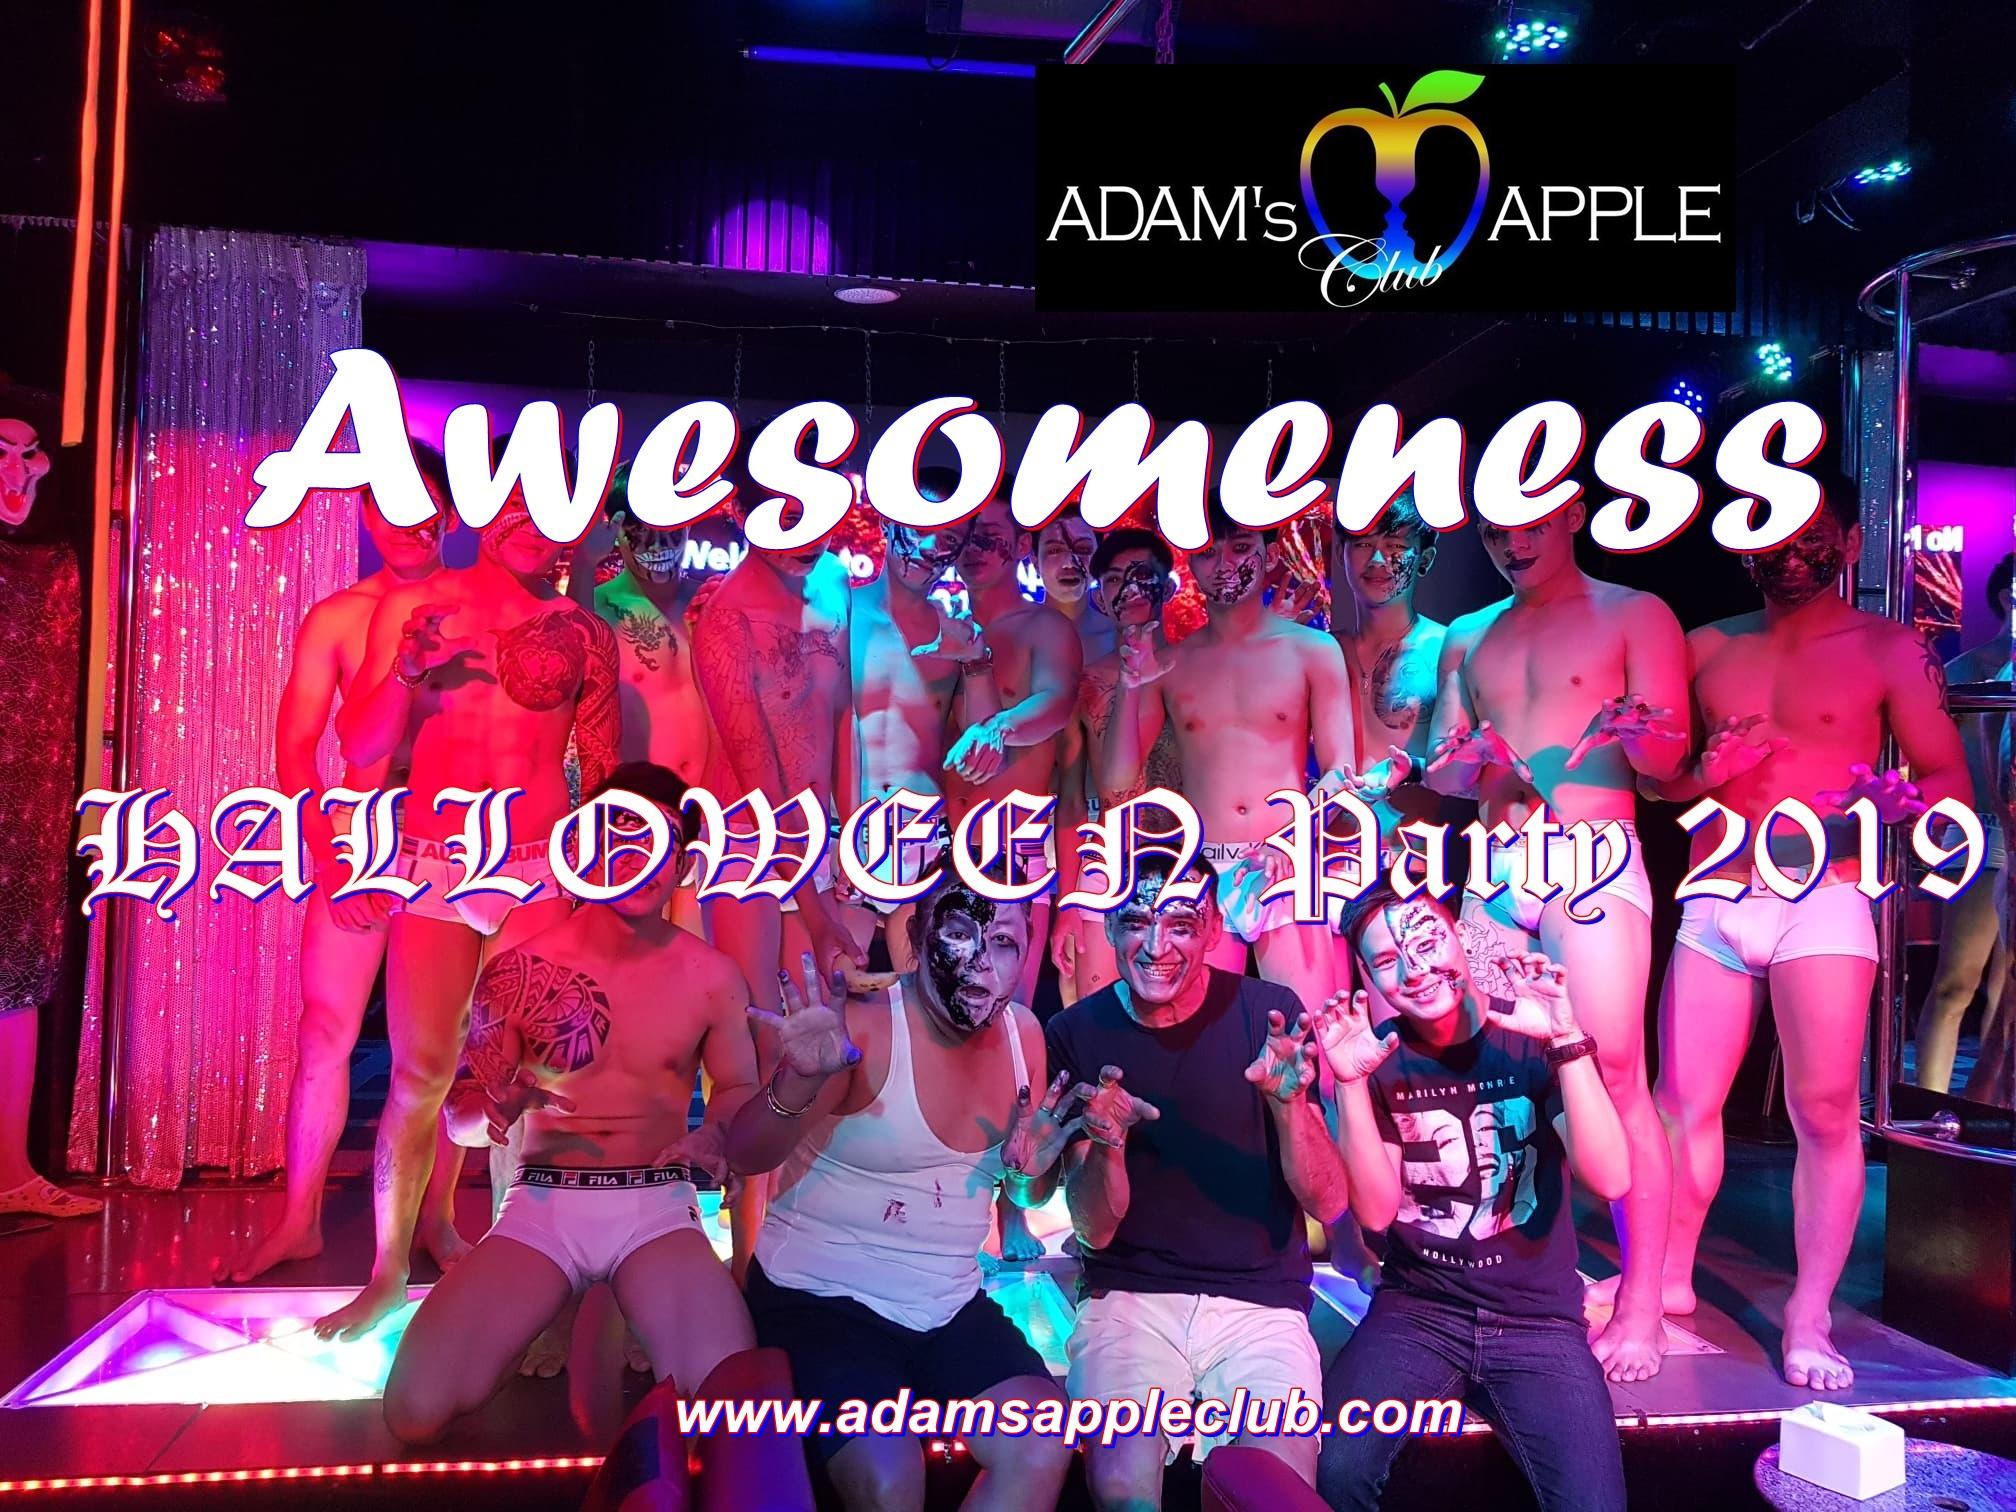 Awesomeness Halloween Adams Apple Club